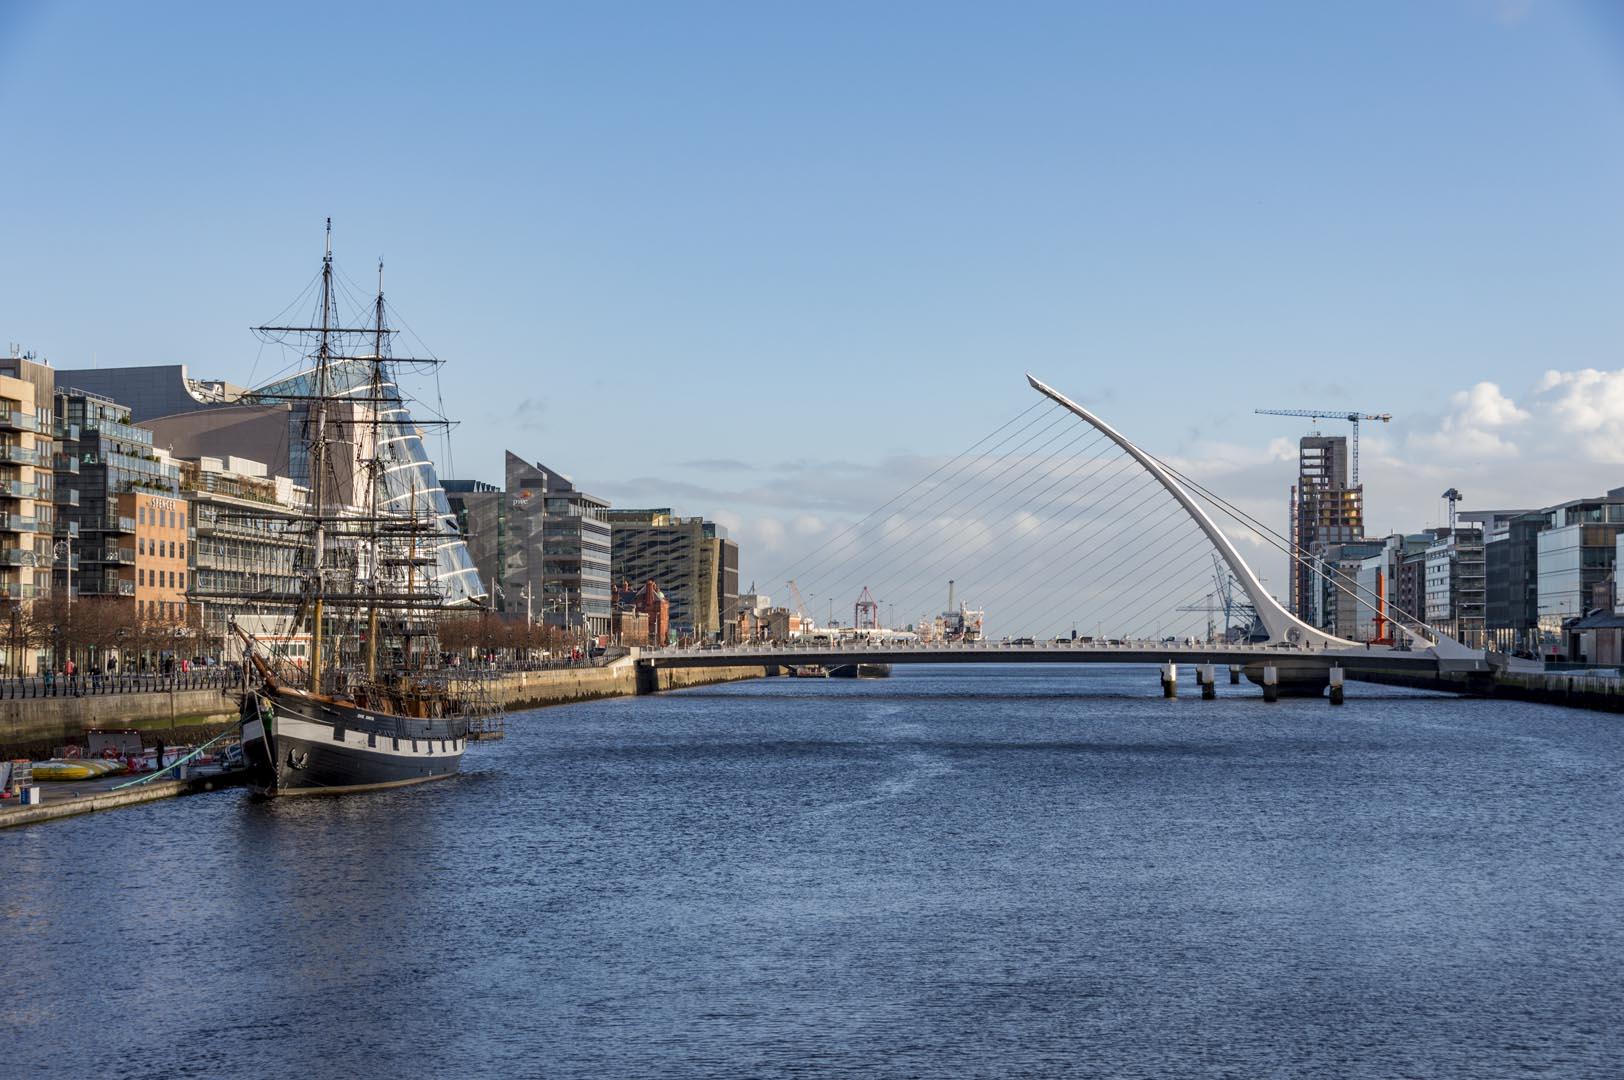 Dublin attractions - Harp Bridge